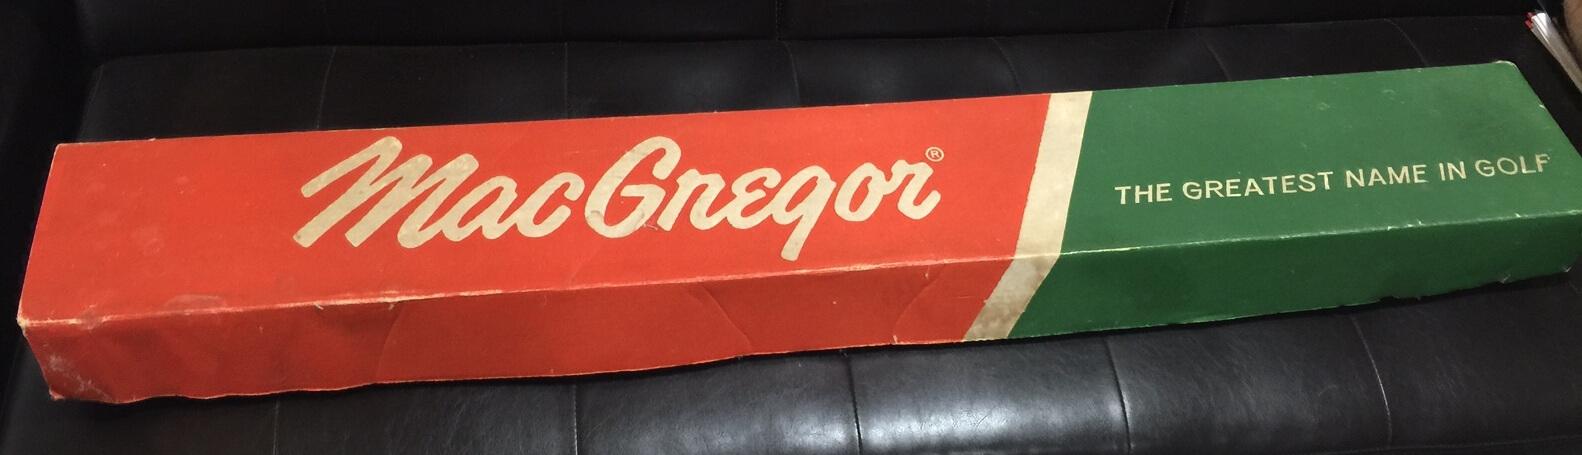 MacGregor VIP Limited 1,3,4,5 Wood Drivers RH Vintage Golf clubs 1970's #80 Set